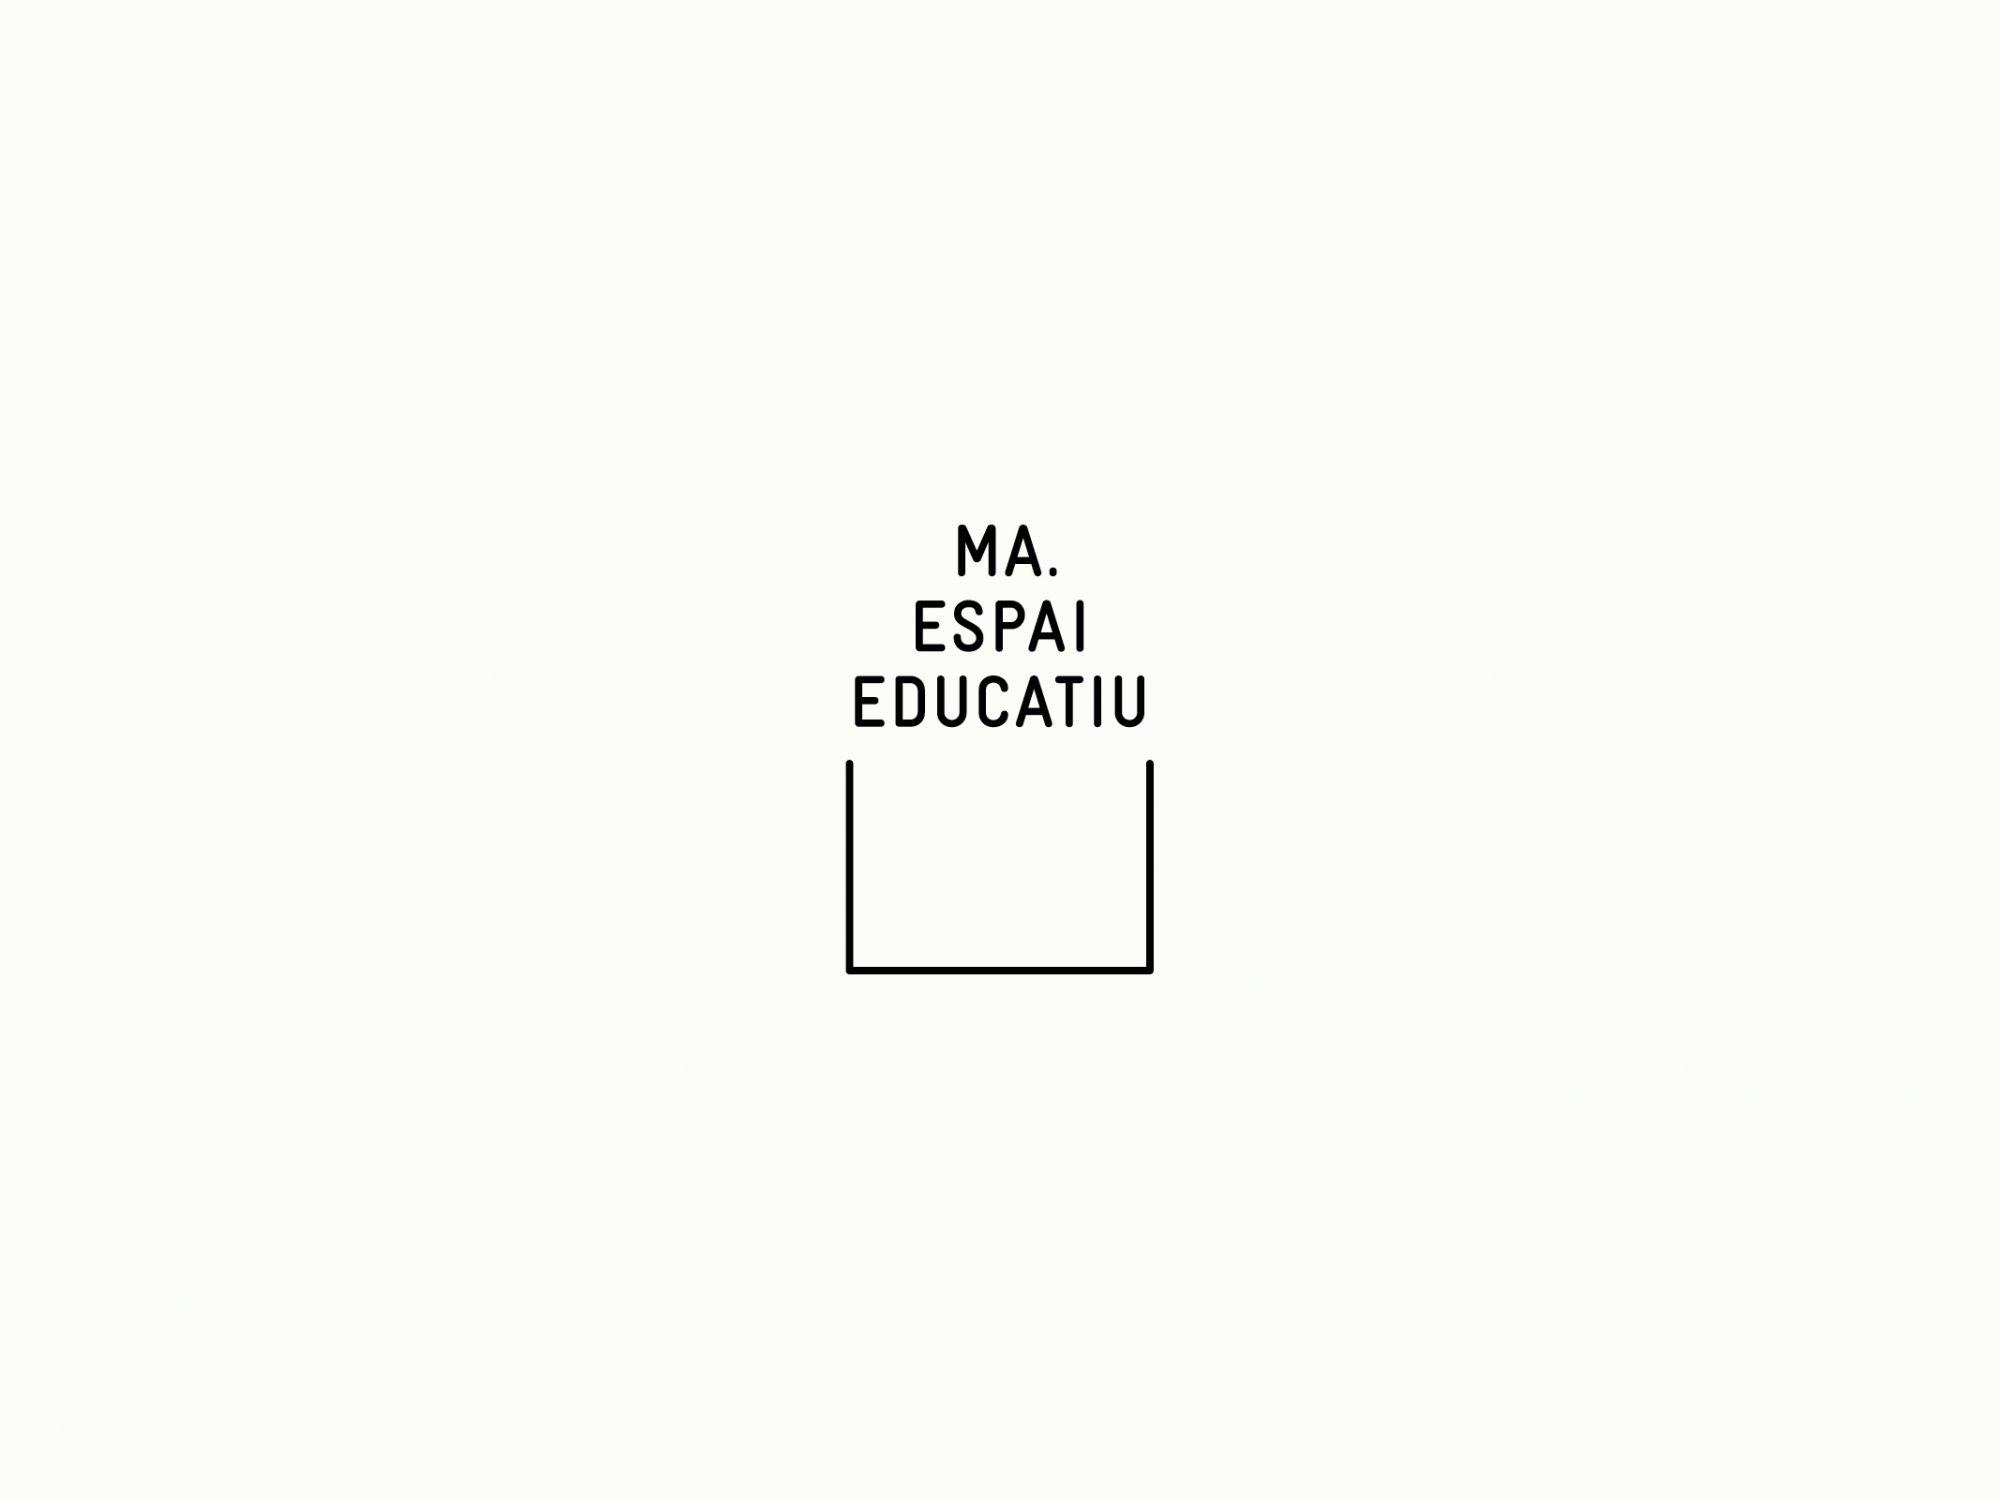 MA. ESPAI EDUCATIU